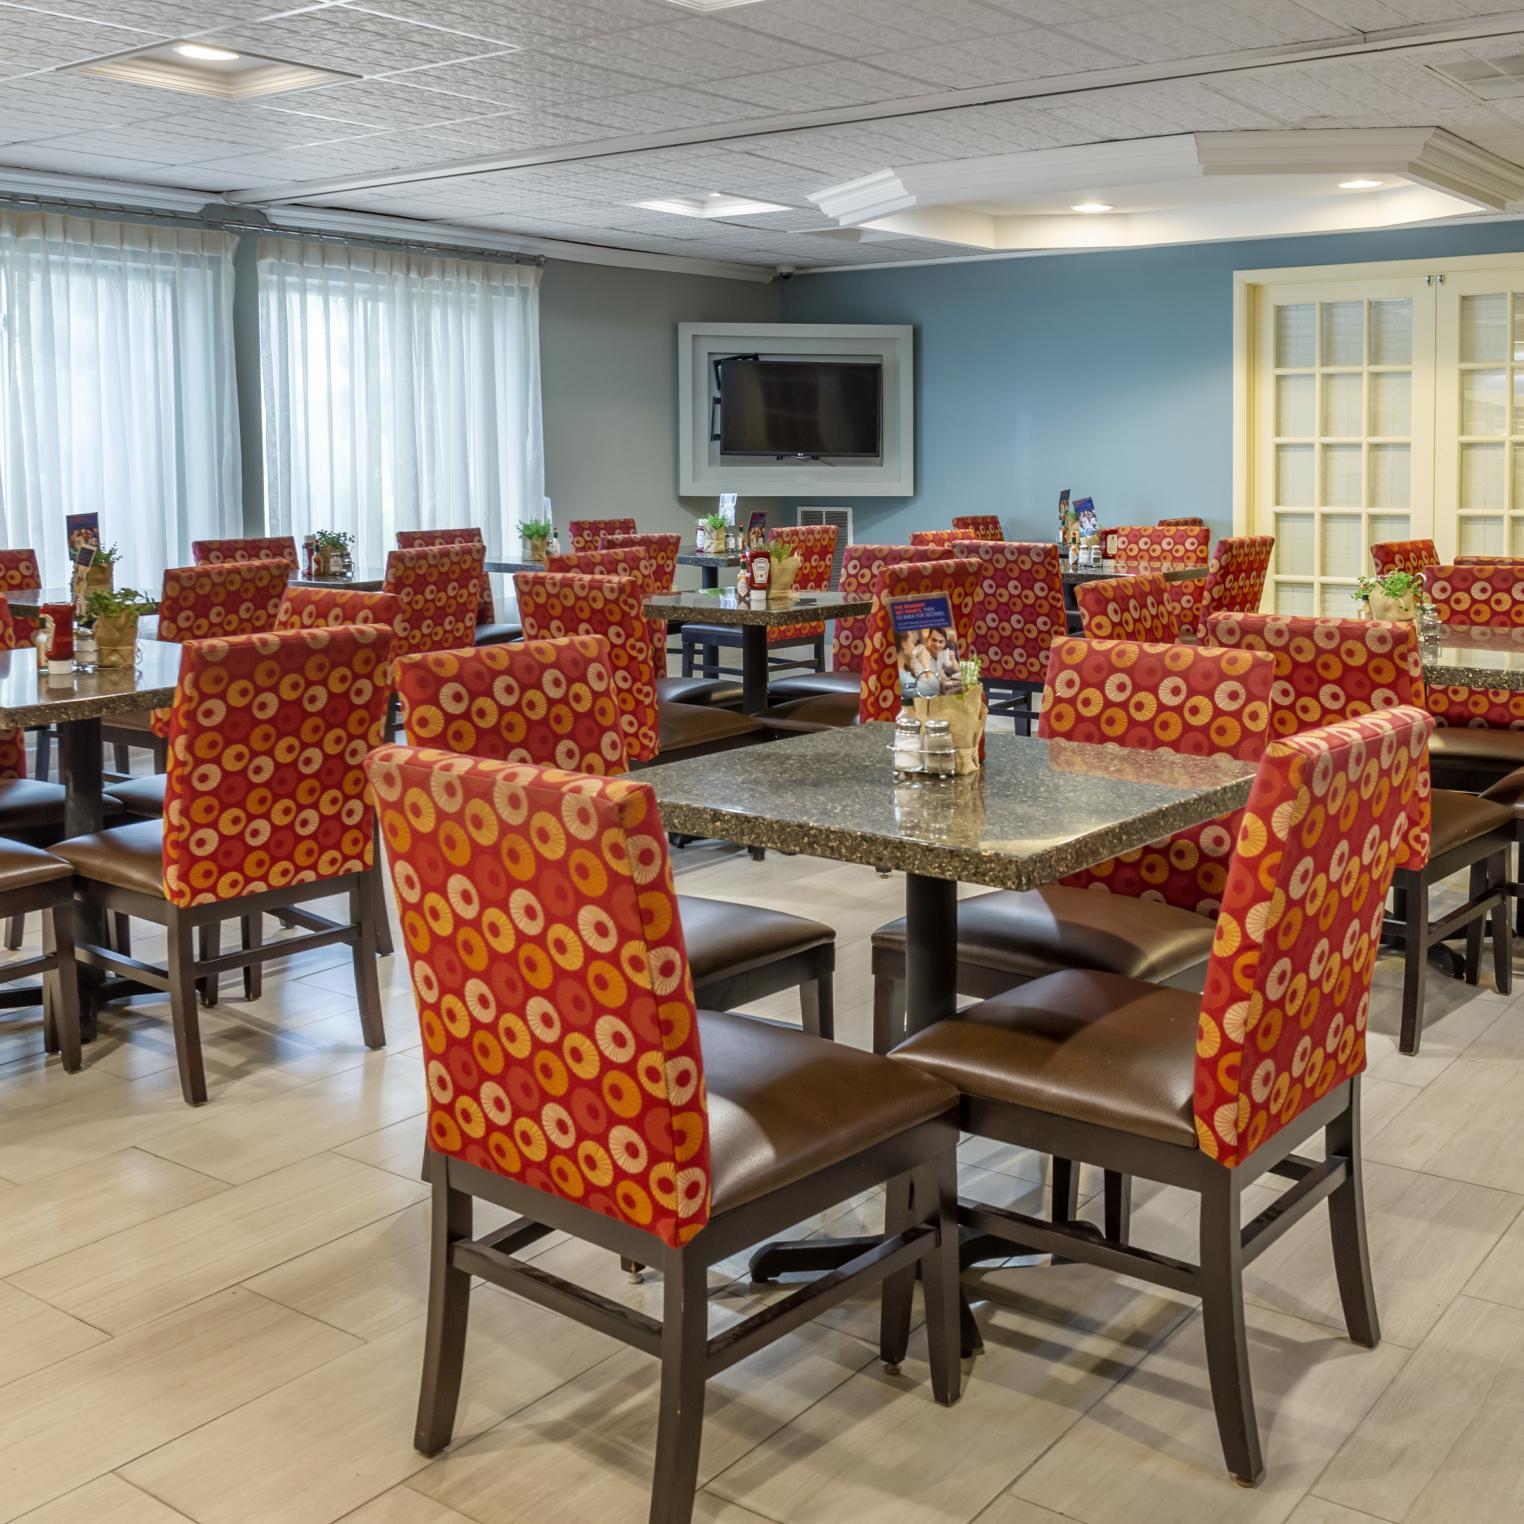 Holiday Inn Express Harrisburg SW Mechanicsburg Dining Room